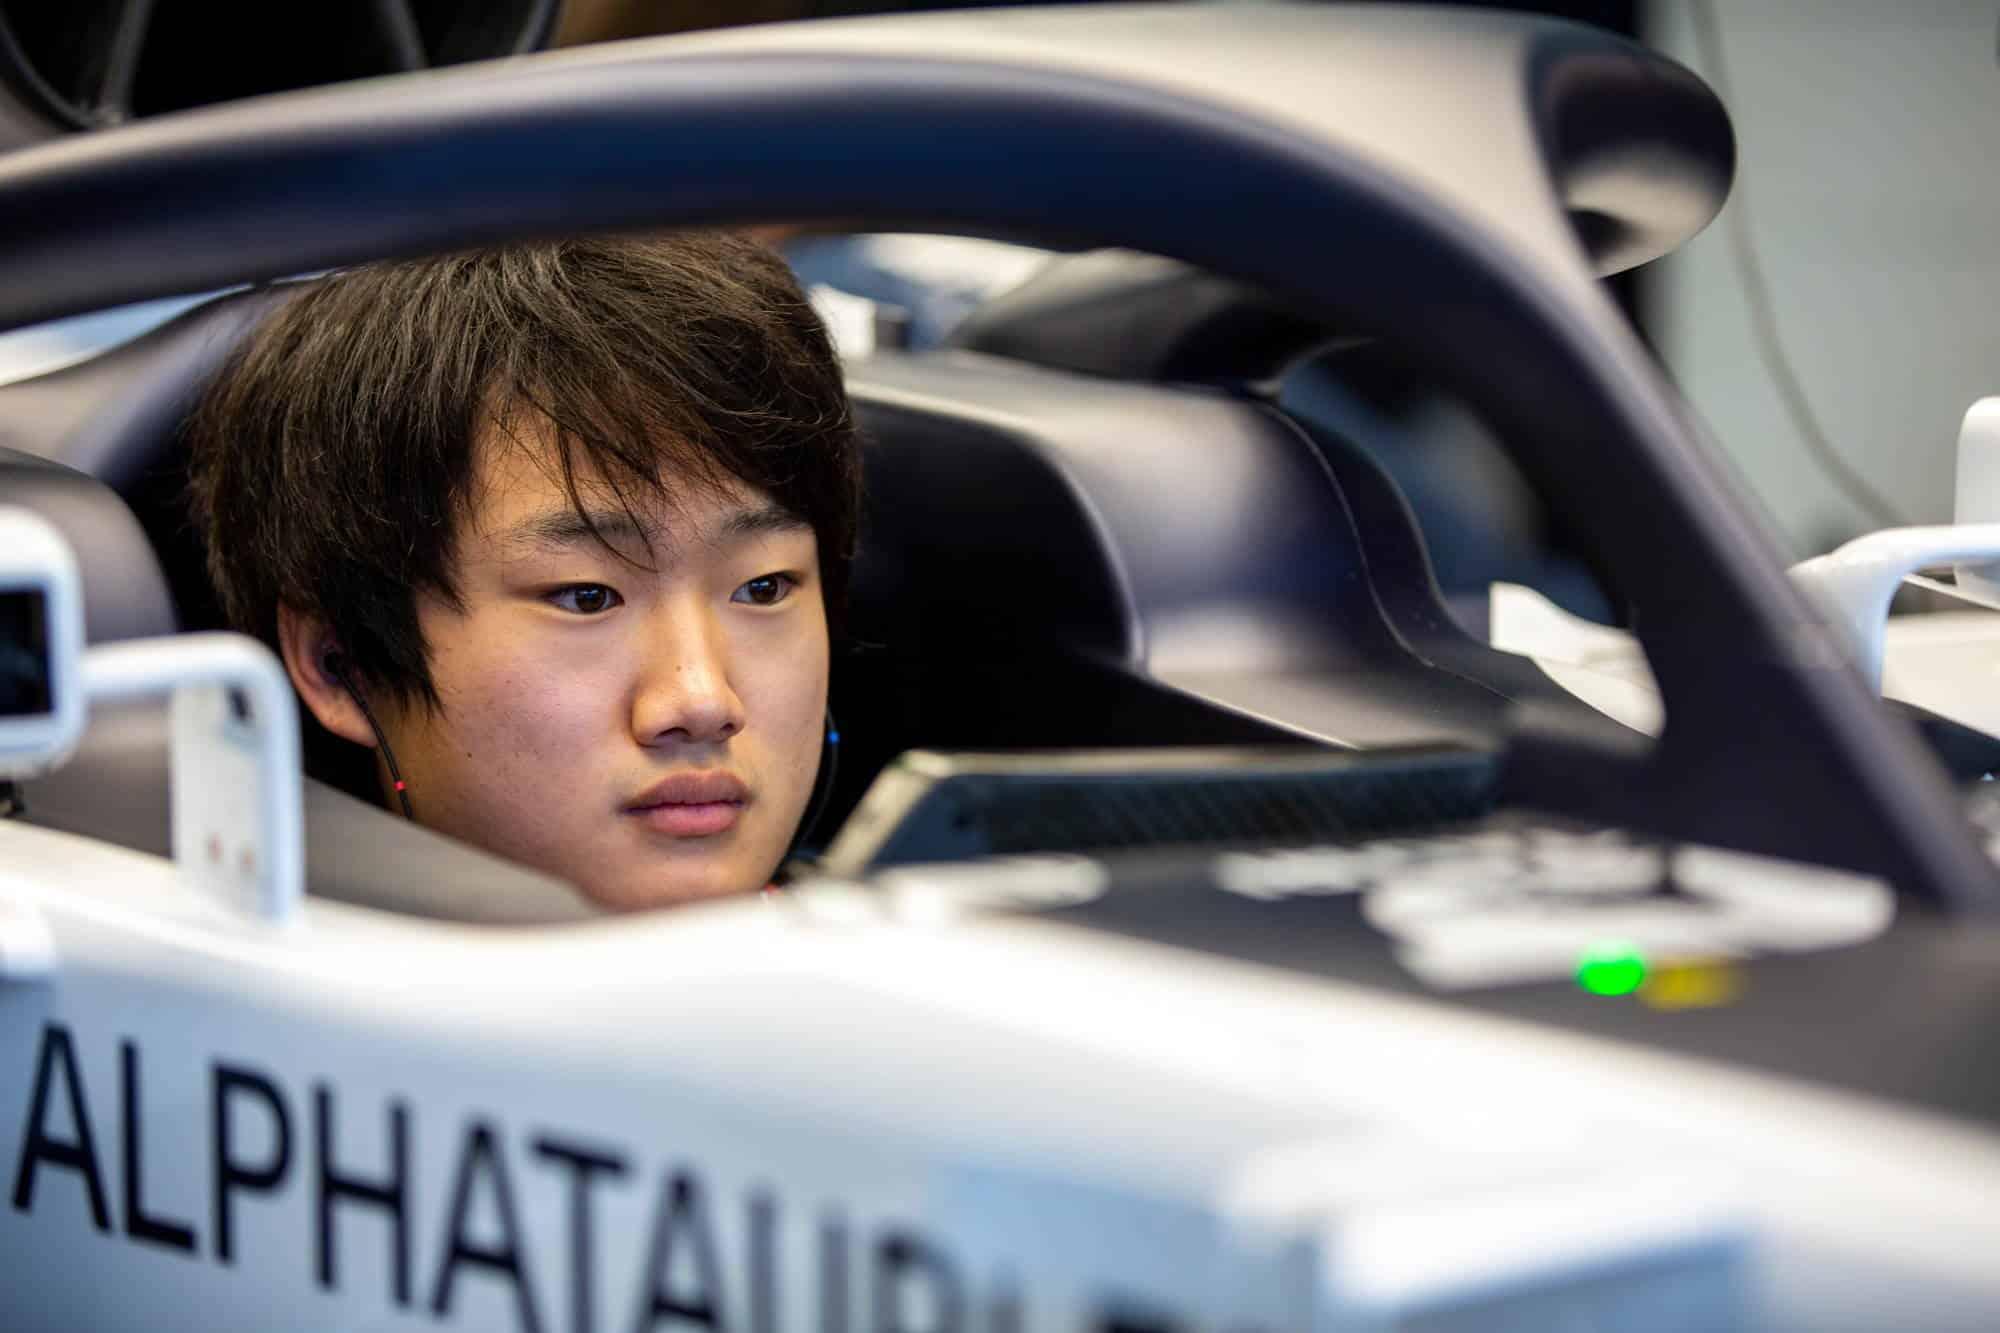 2020 Abu Dhabi GP post race test Yuki Tsunoda AlphaTauri in the car Photo Red Bull